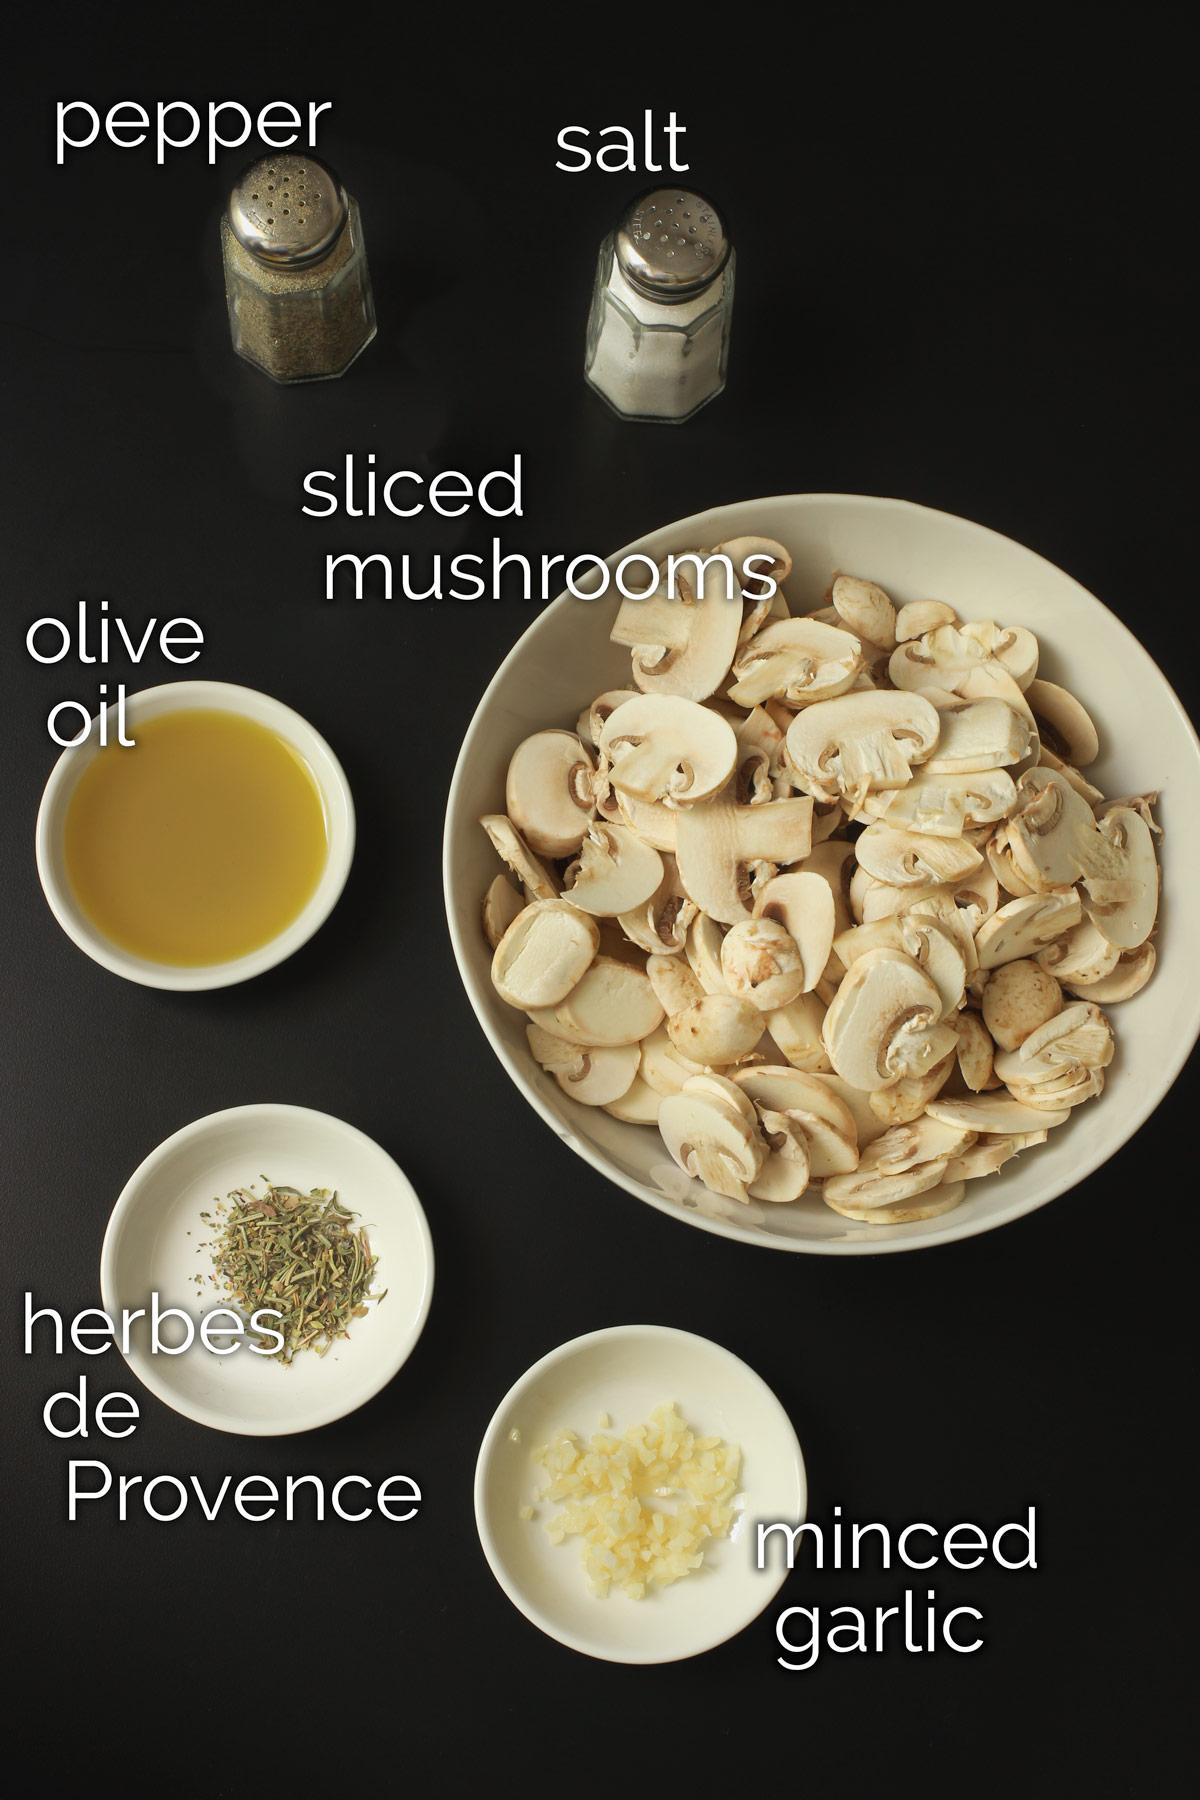 ingredients for sautéed mushrooms on black tabletop.